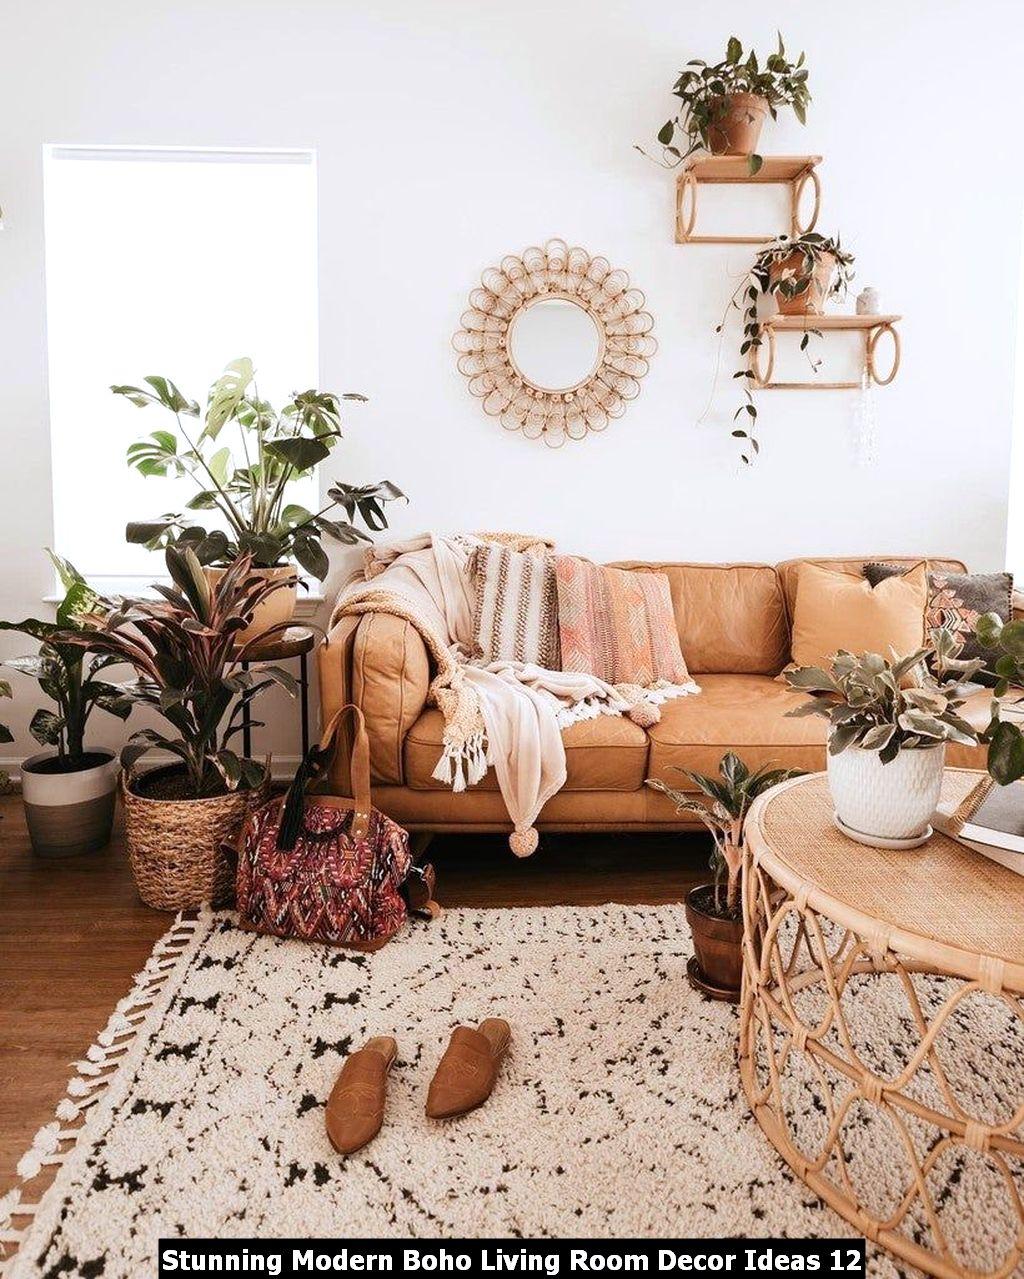 Stunning Modern Boho Living Room Decor Ideas 12